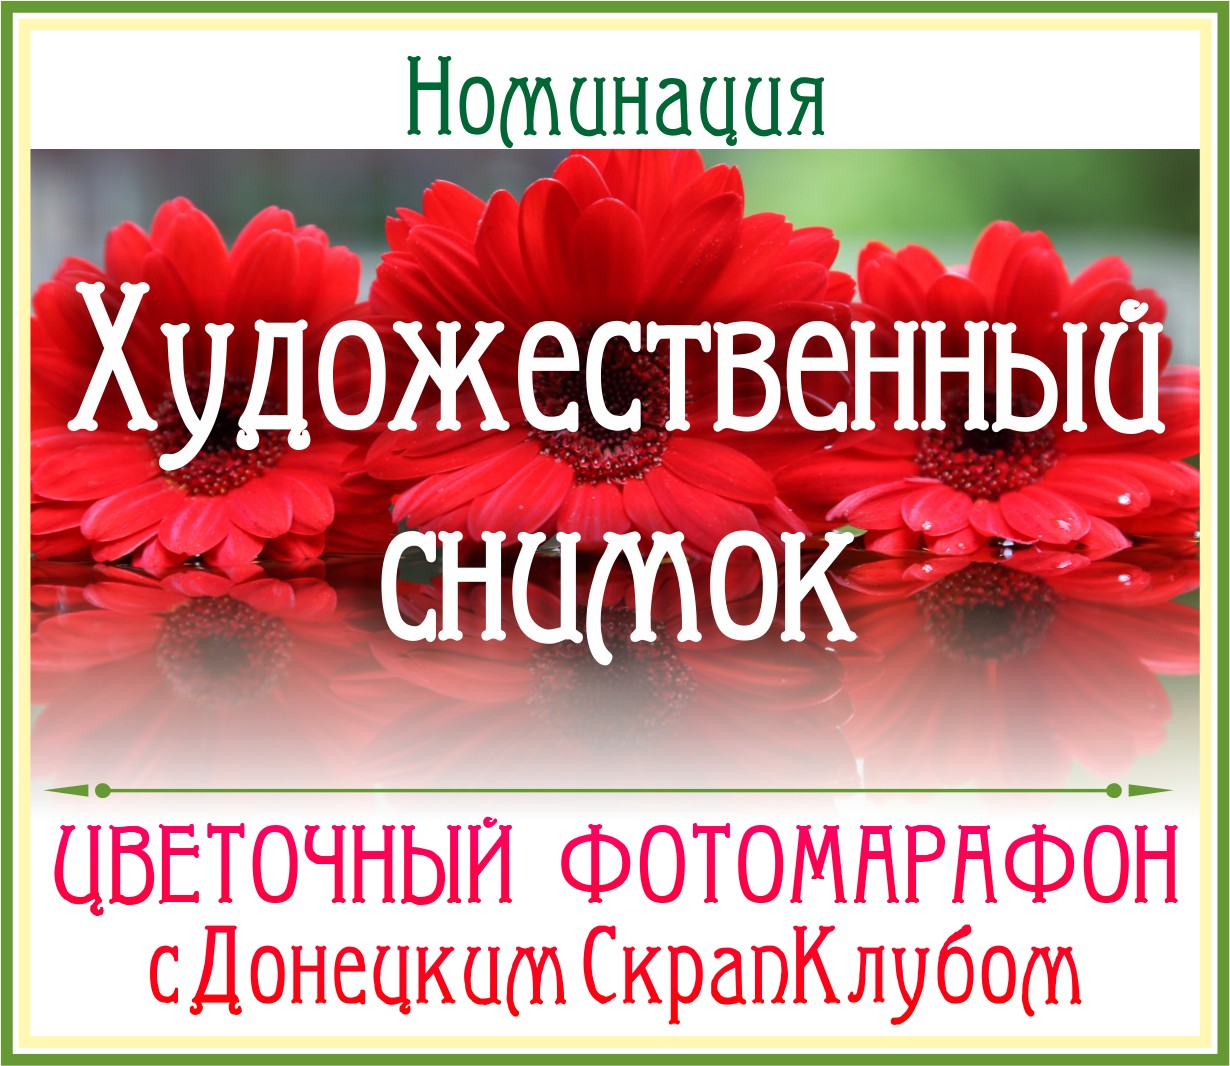 http://scrapclub-donetsk.blogspot.com/2014/06/1_23.html